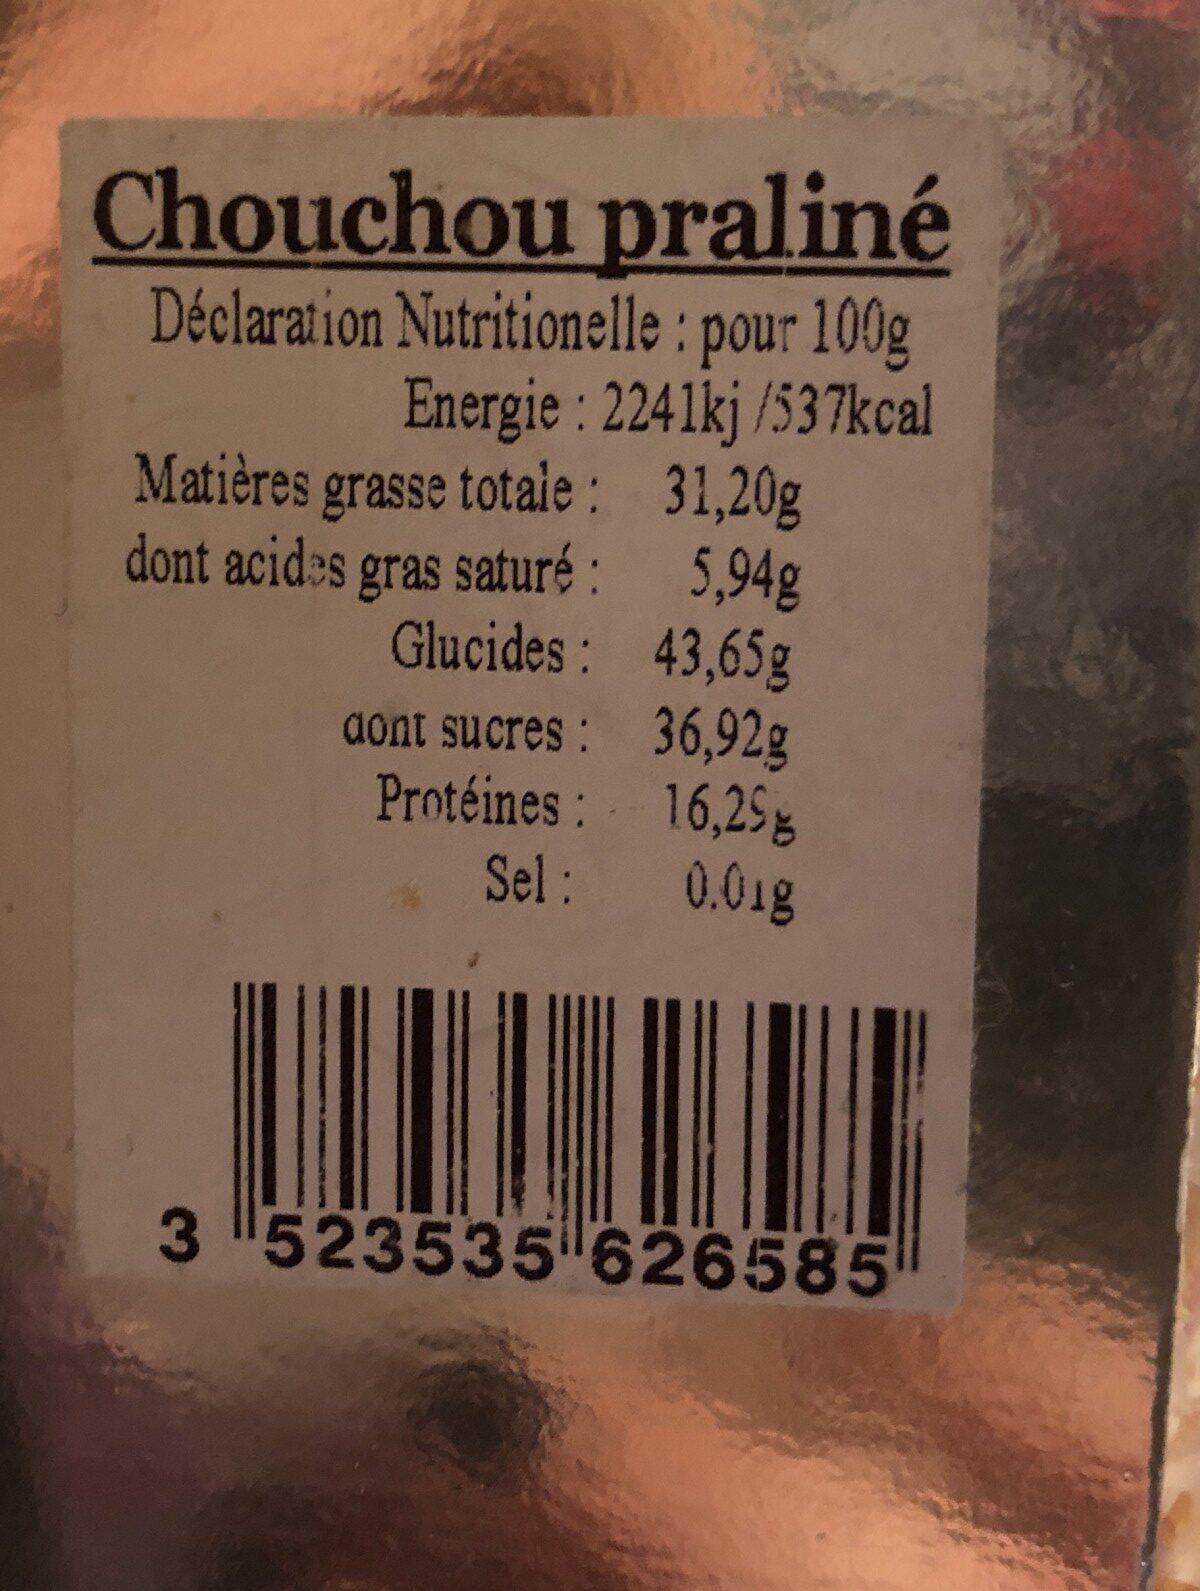 chouchou praliné - Ingrediënten - fr